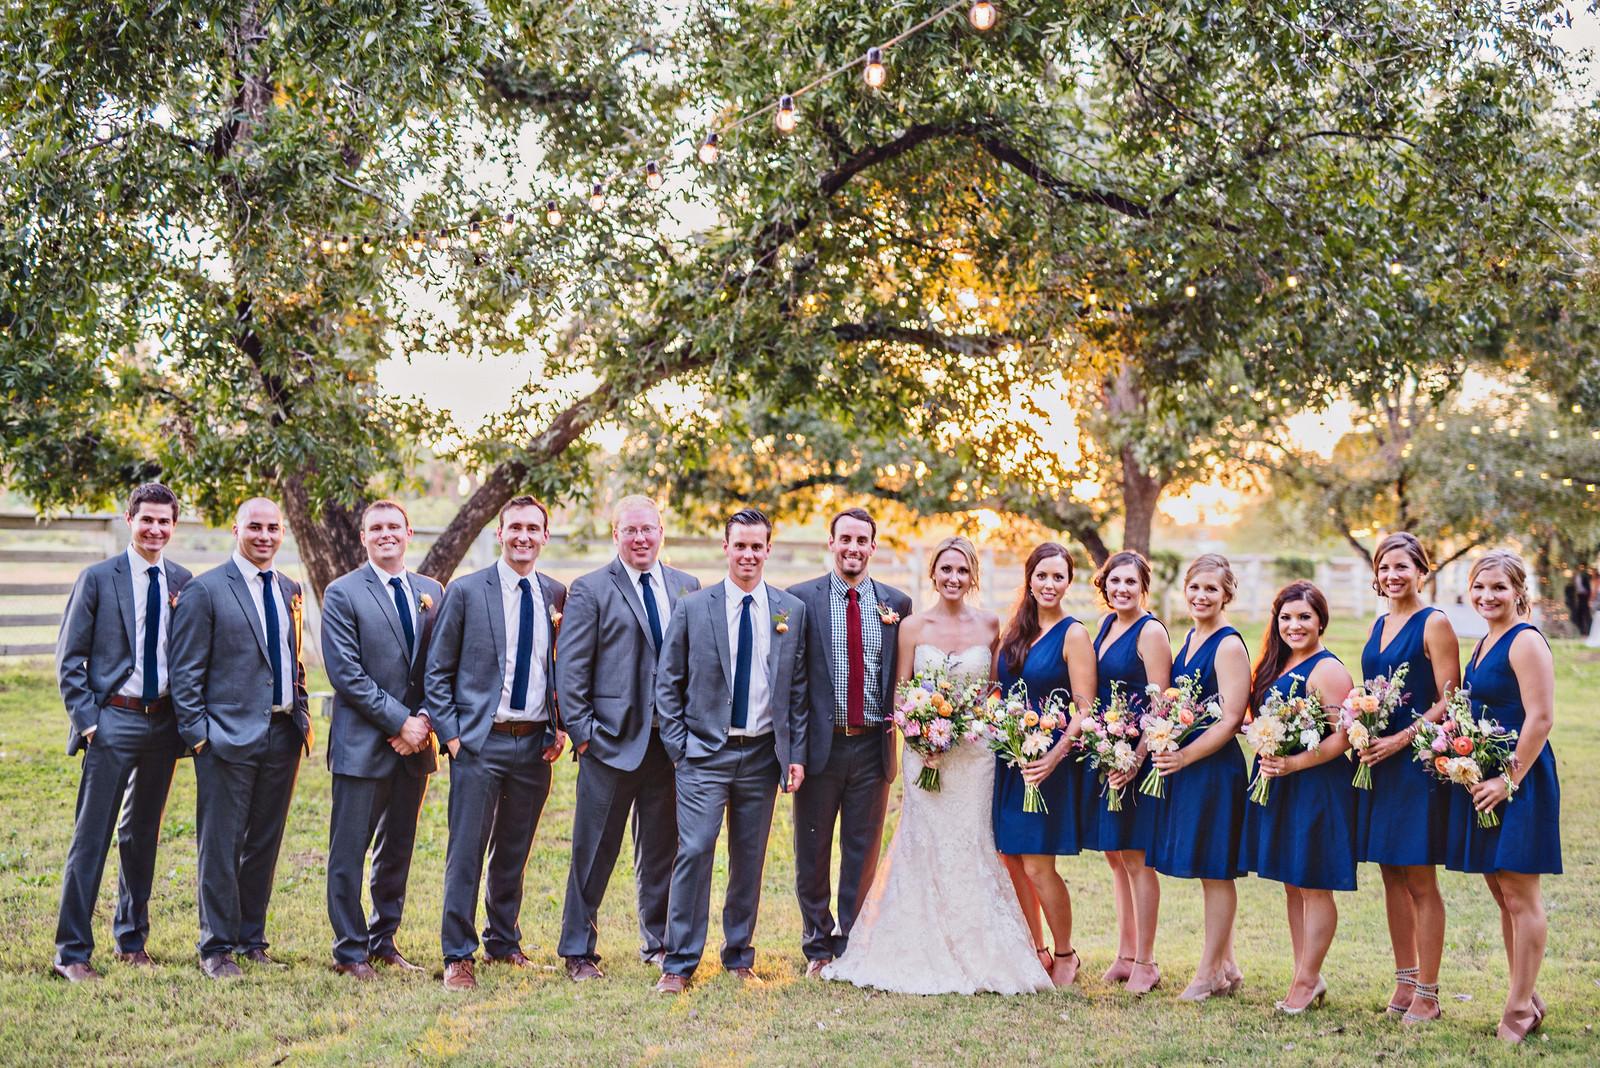 Wedding Open House August 30 In Phoenix